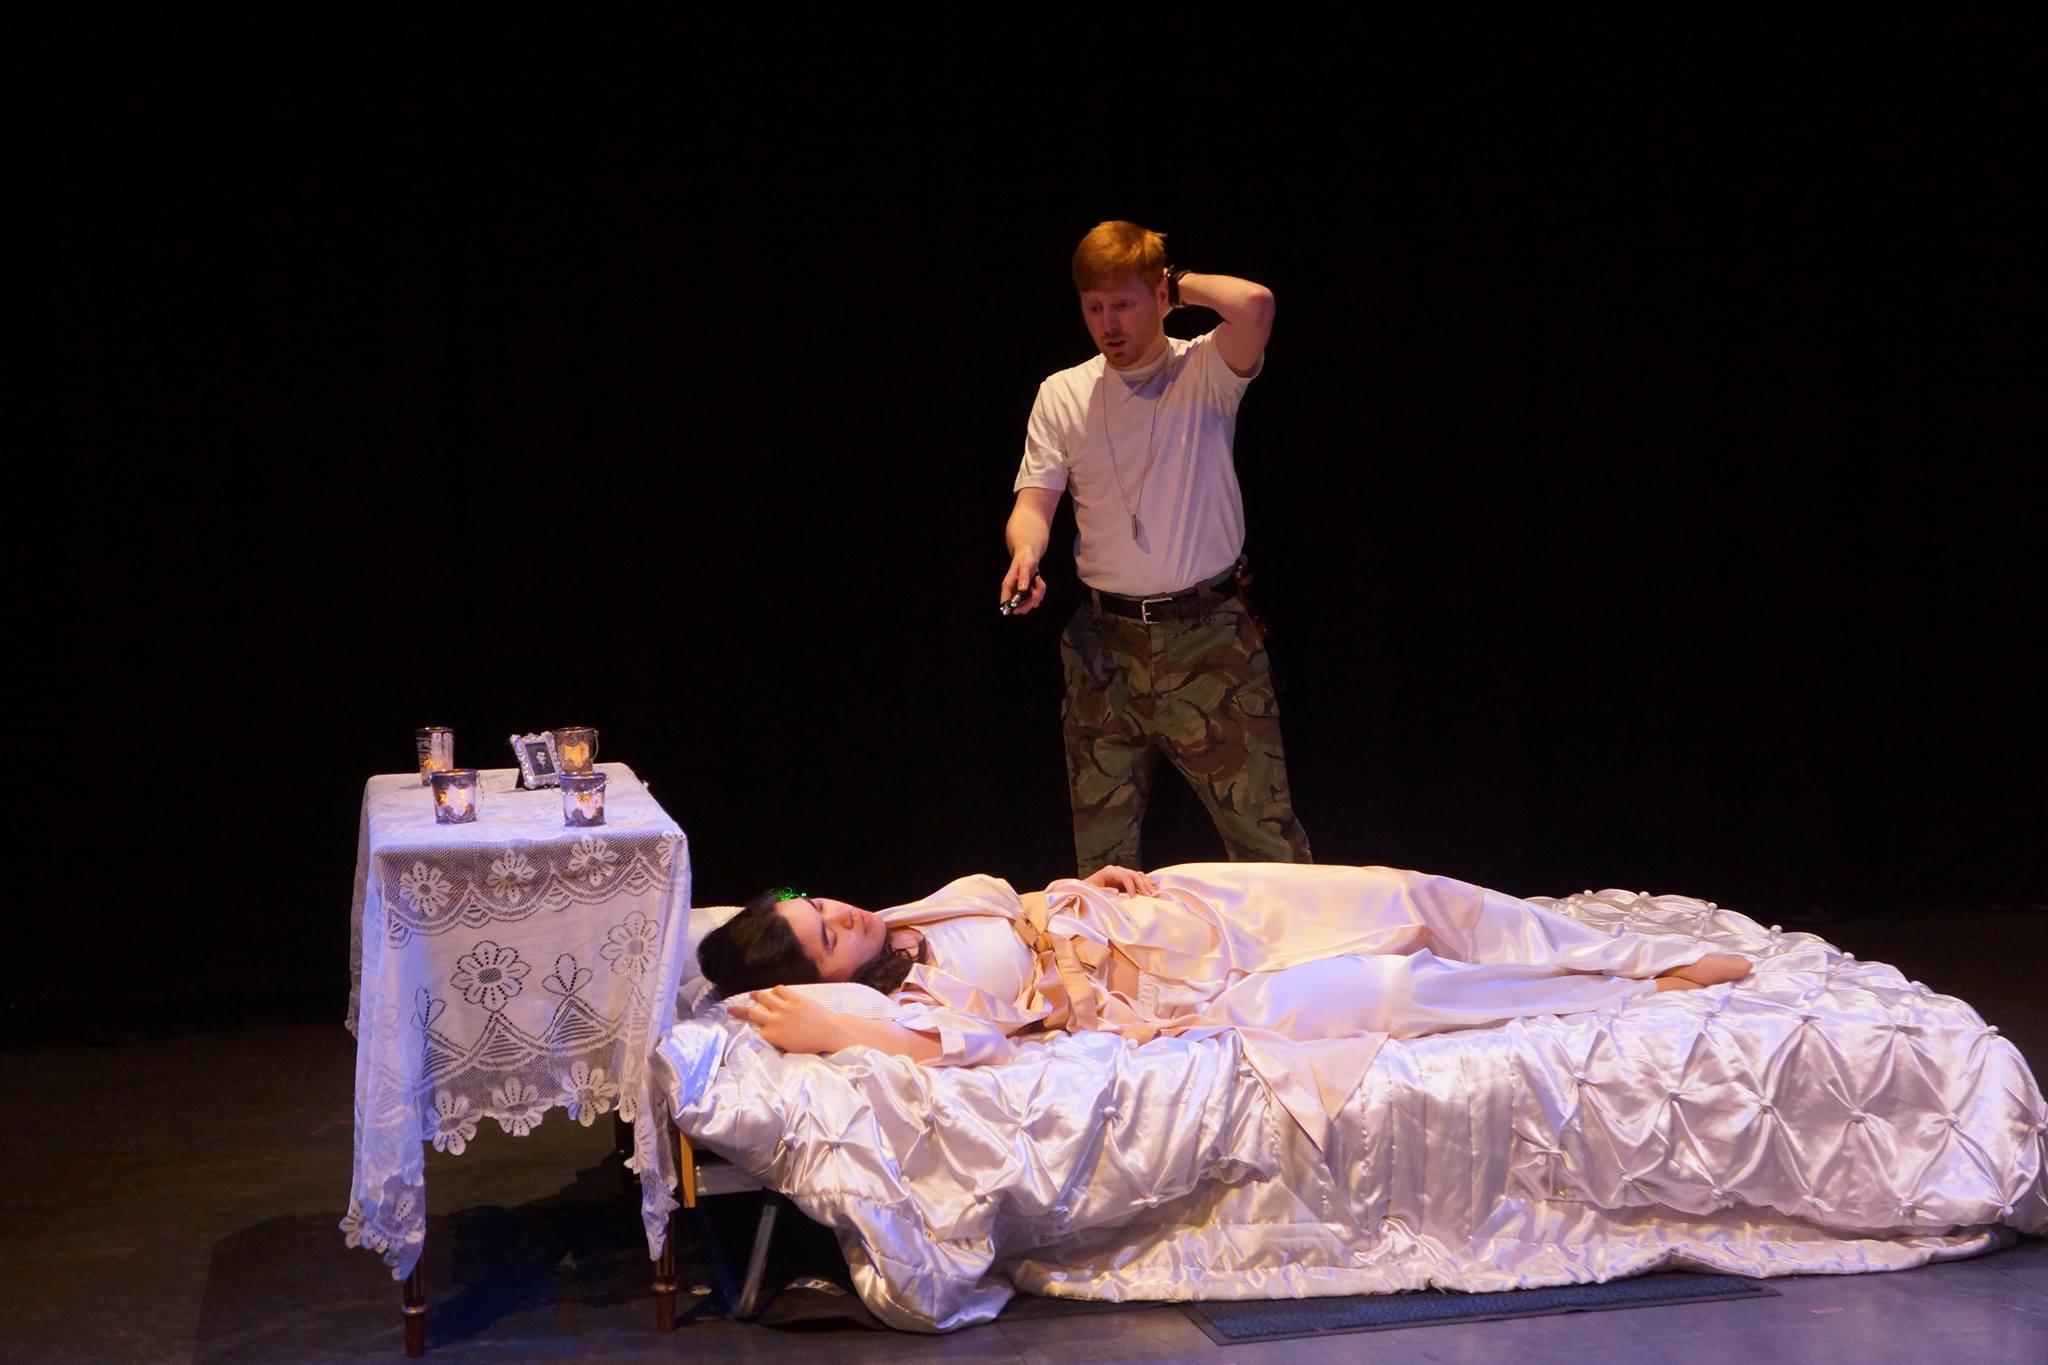 Tarquinius, The Rape of Lucretia - Royal Northern College of Music Opera Scenes, 2014